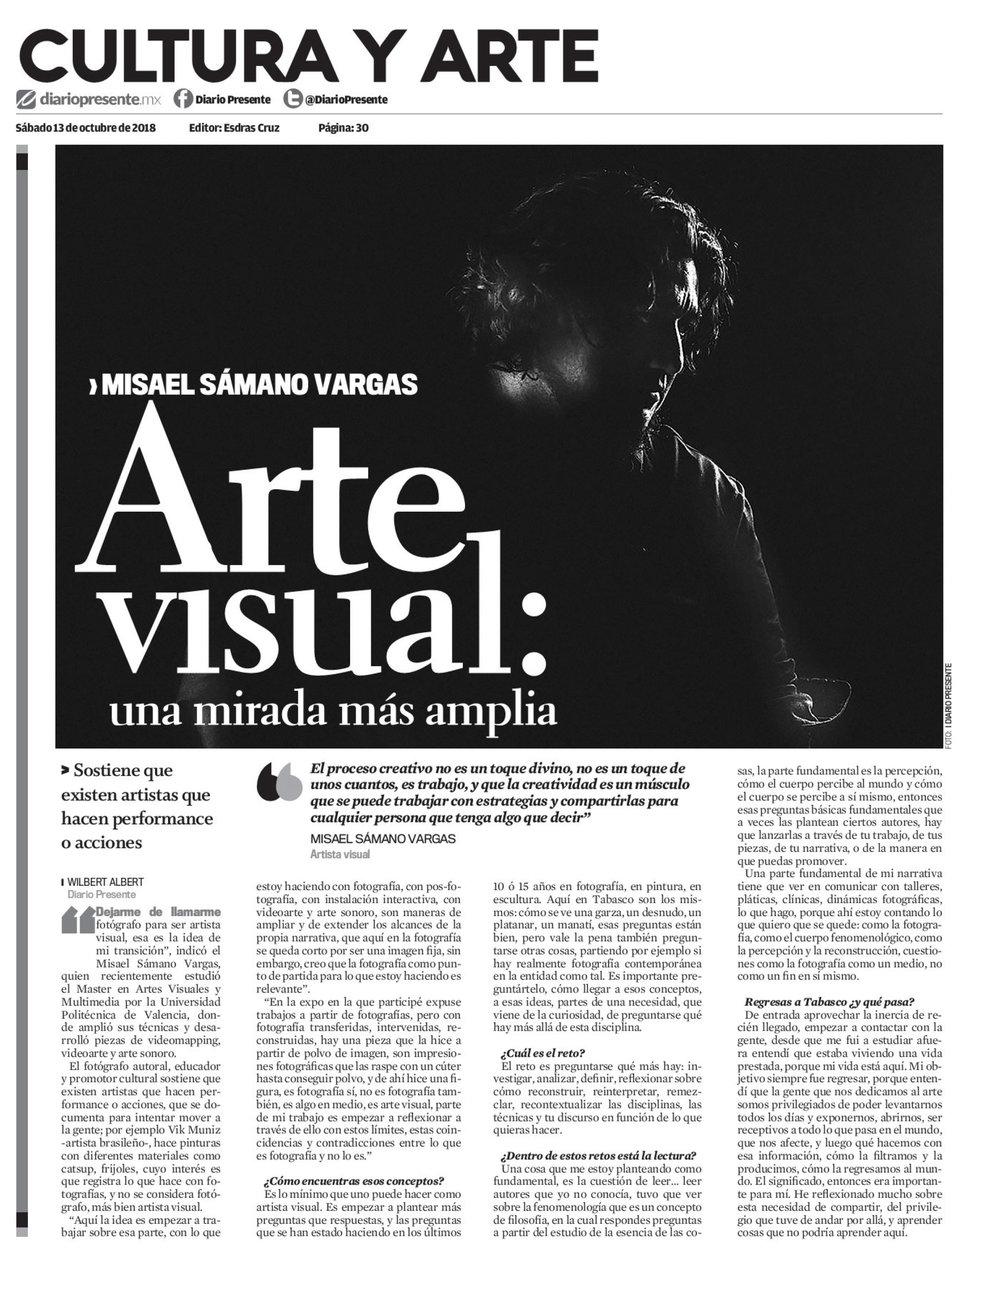 Presente Arte Visual Entrevista-1 ima.jpg